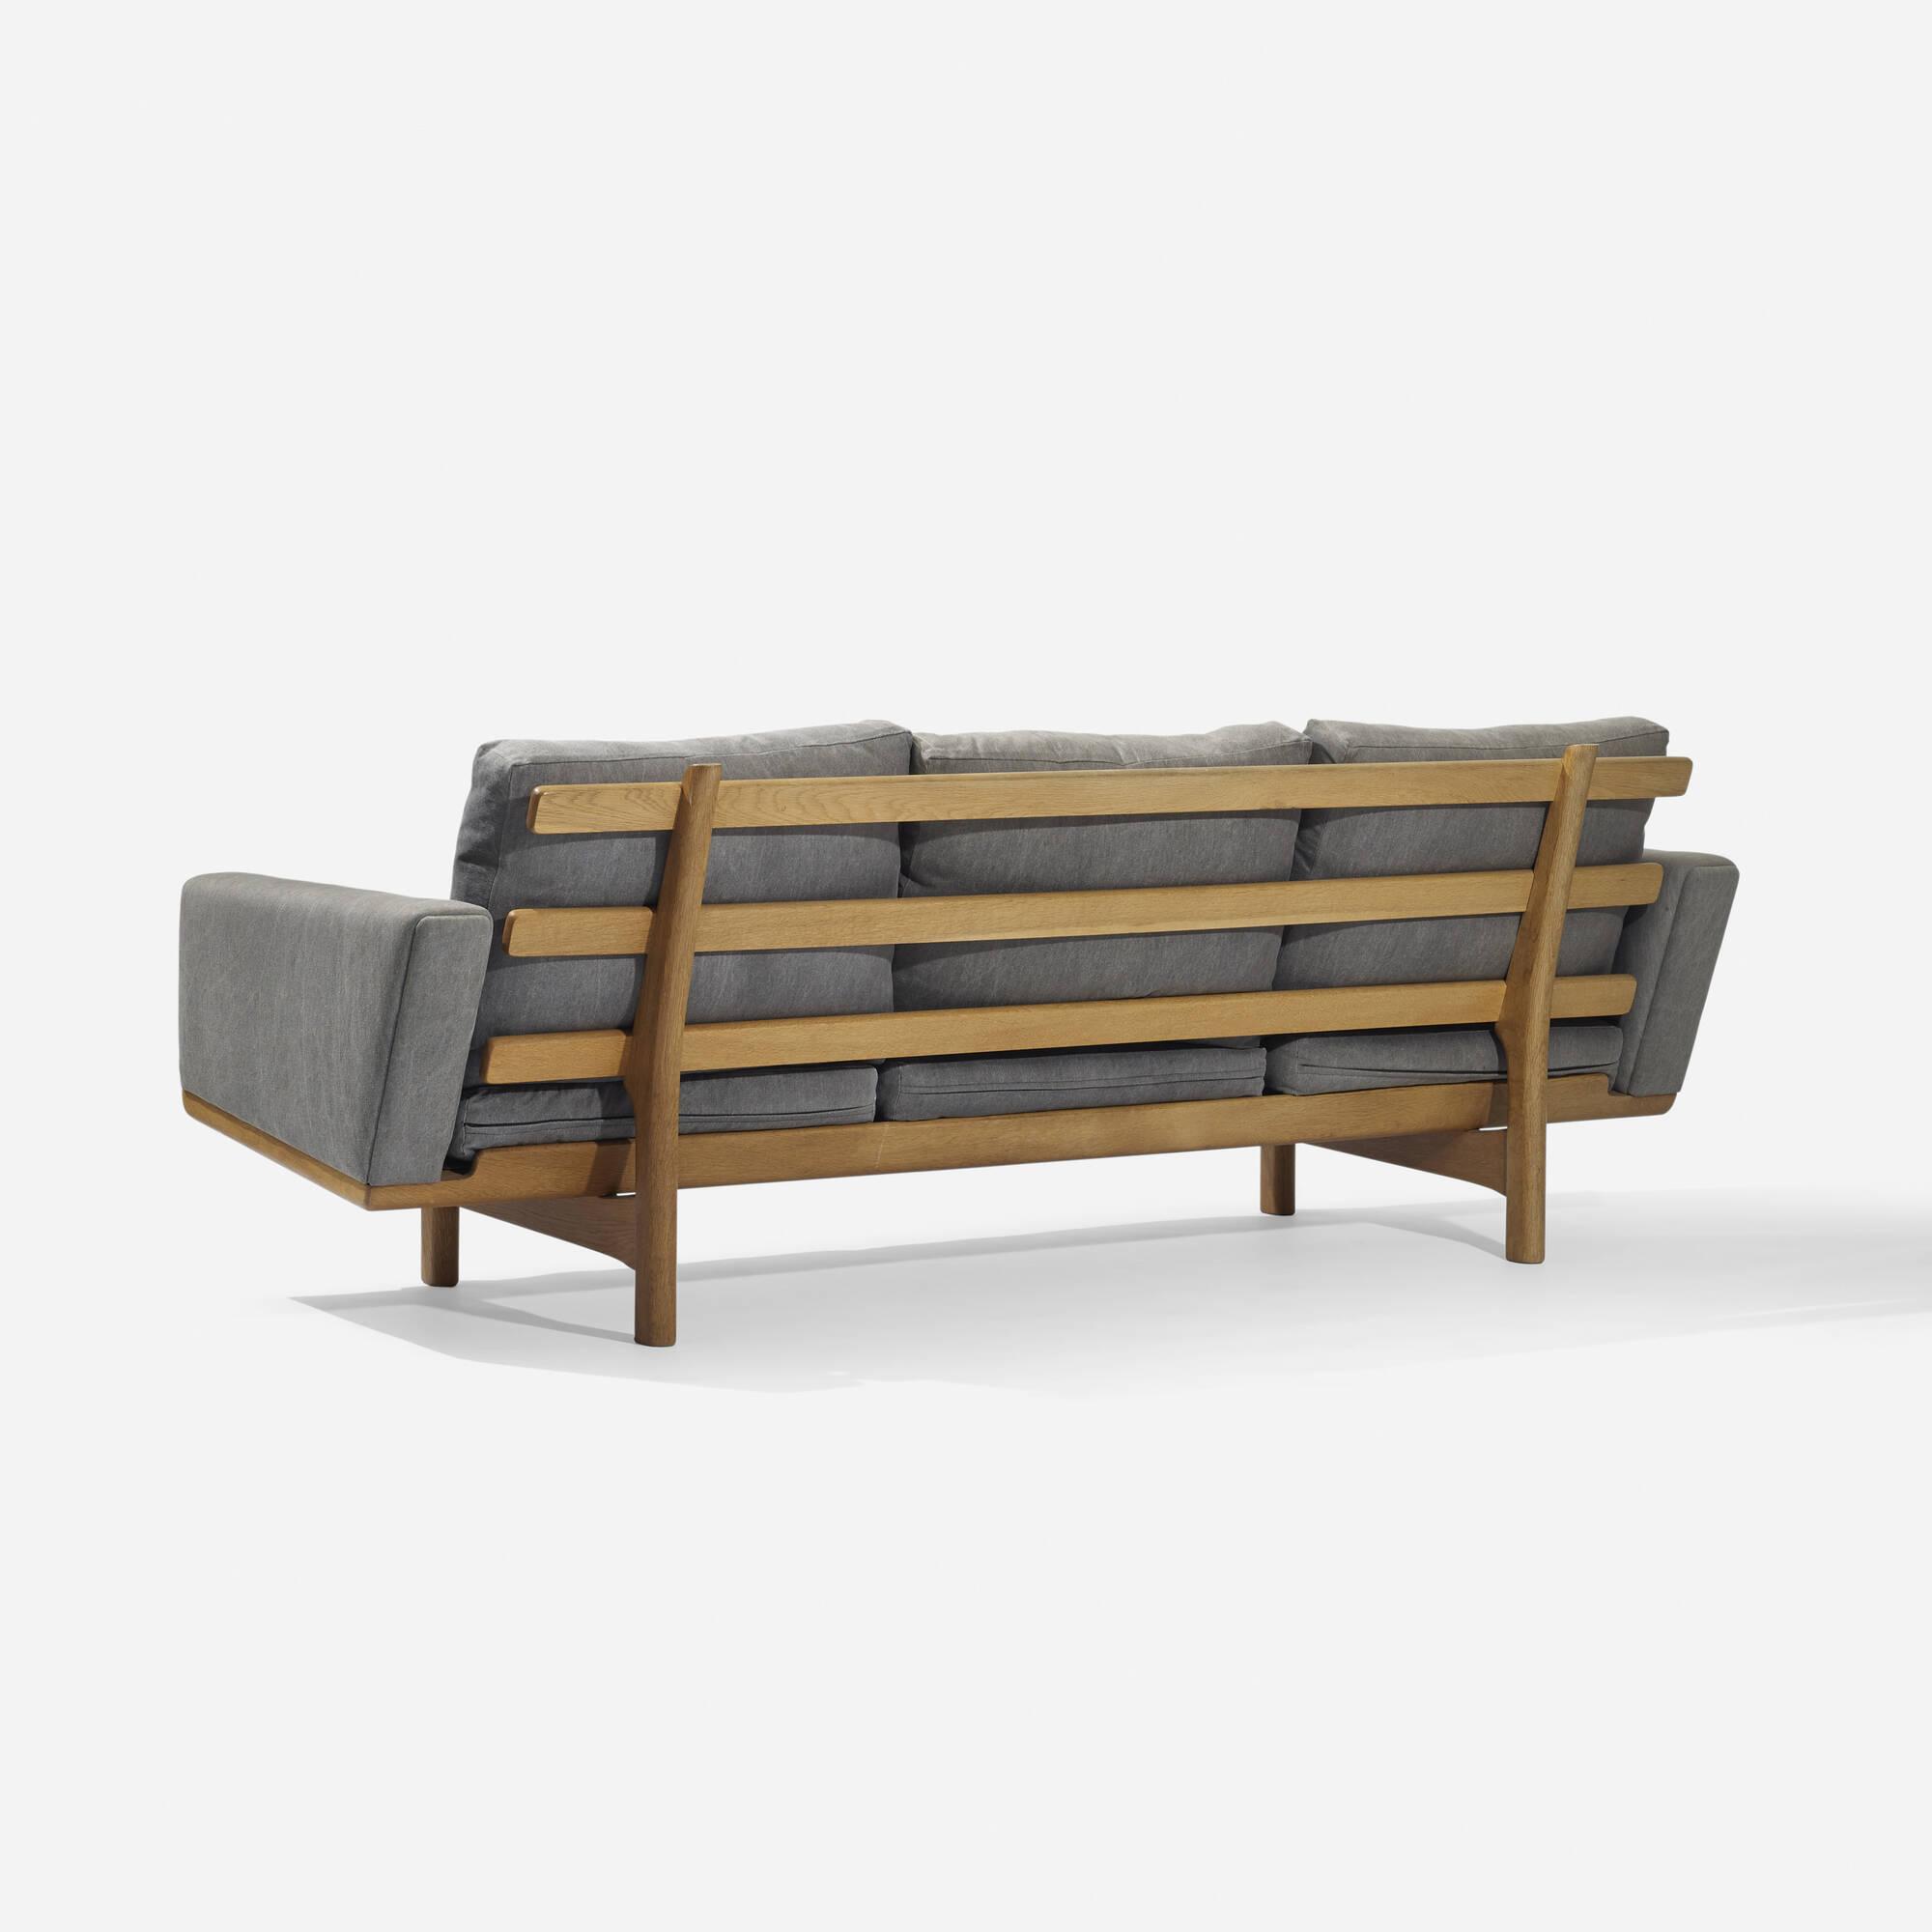 345 Hans J Wegner sofa model GE236 3 Scandinavian Design 8